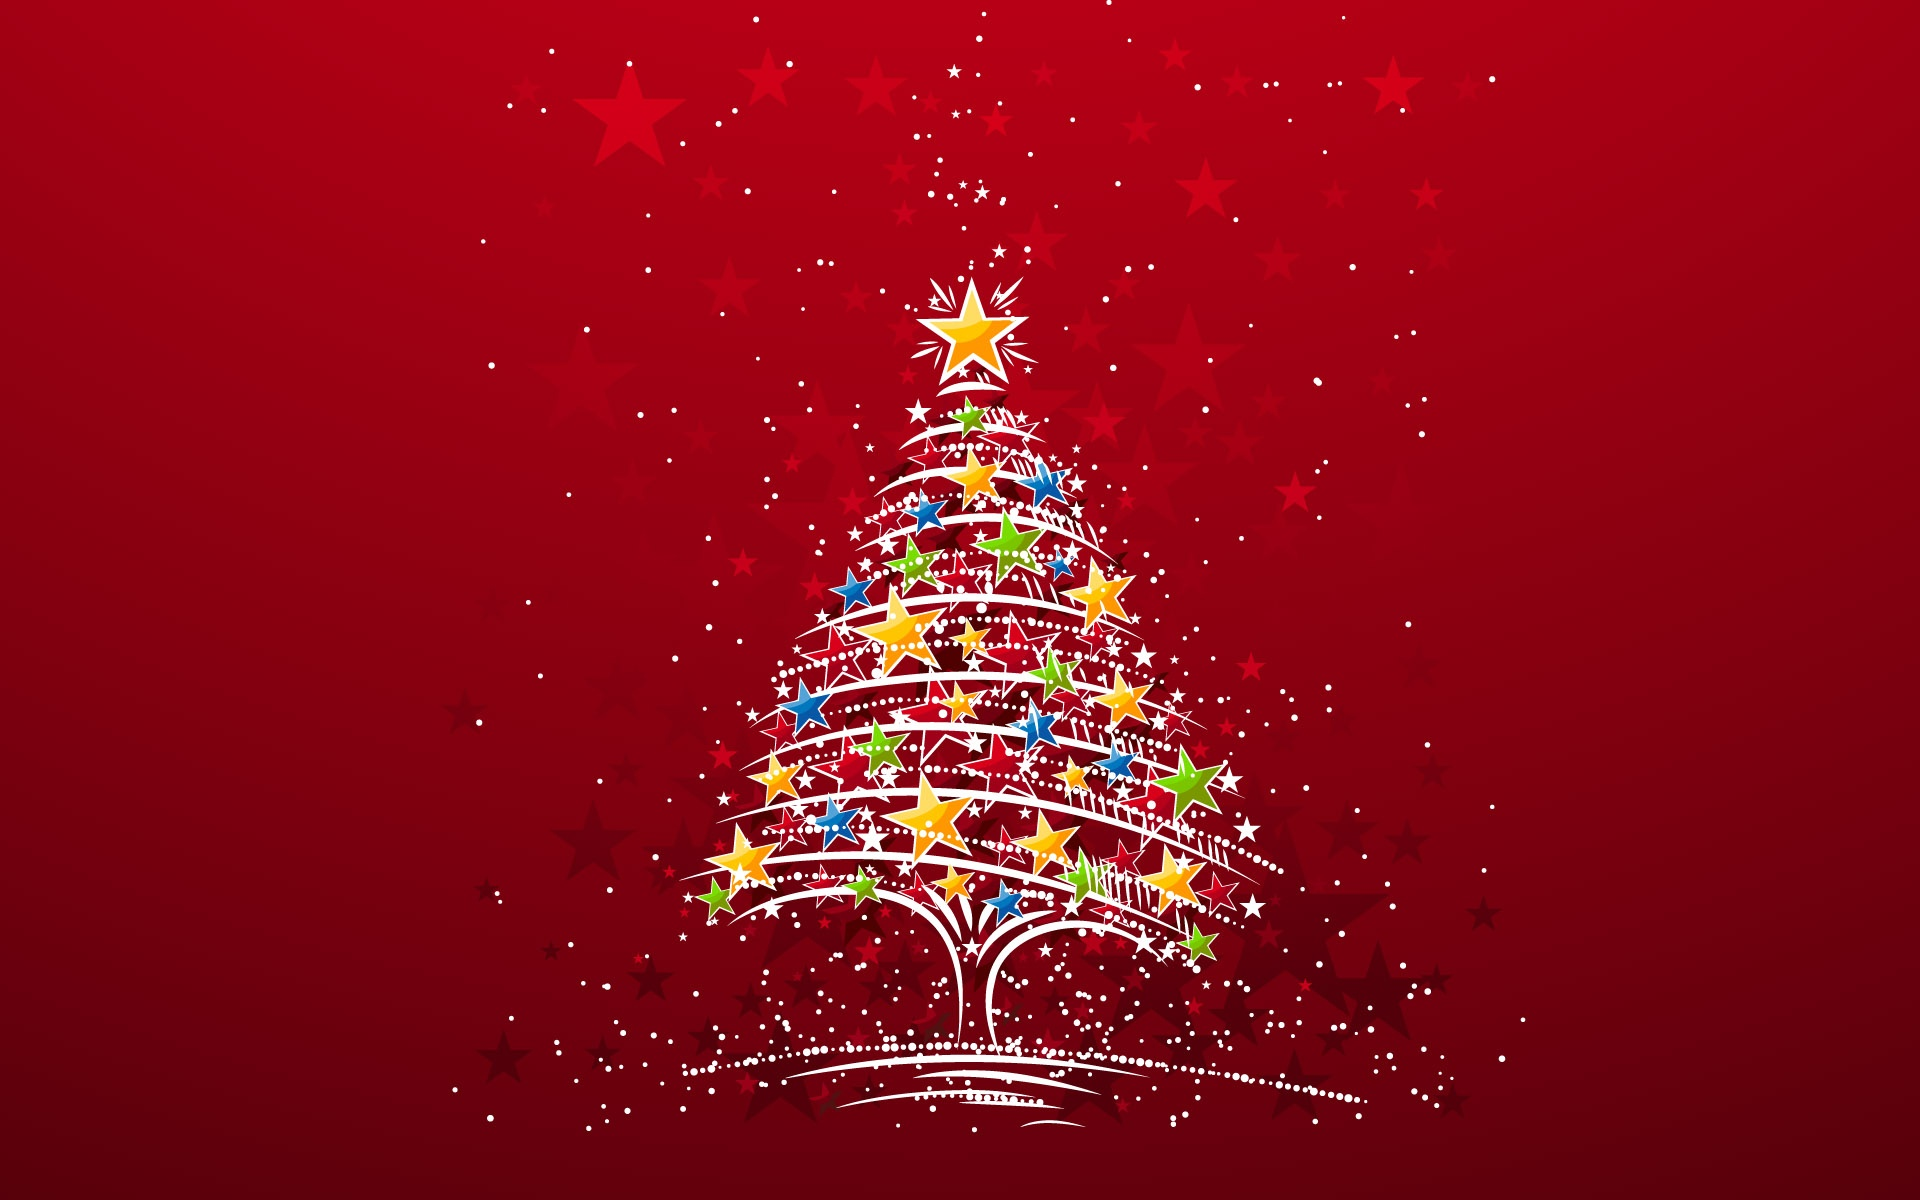 20 wonderful hi res christmas wallpapers